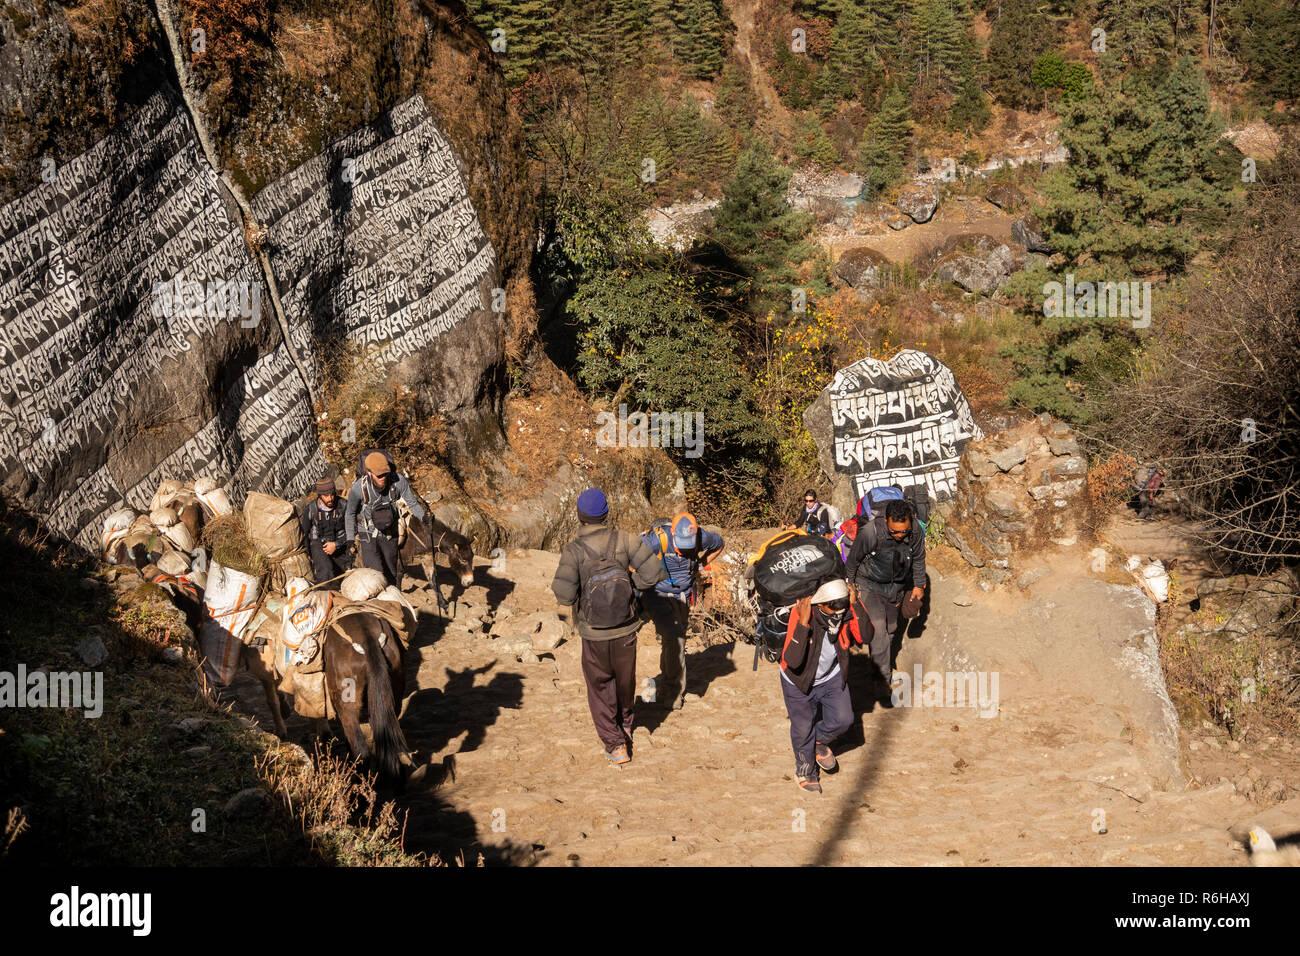 Nepal, Monju, (Manjo) large carved Buddhist mani stones beside steep stone path at northern end of village - Stock Image